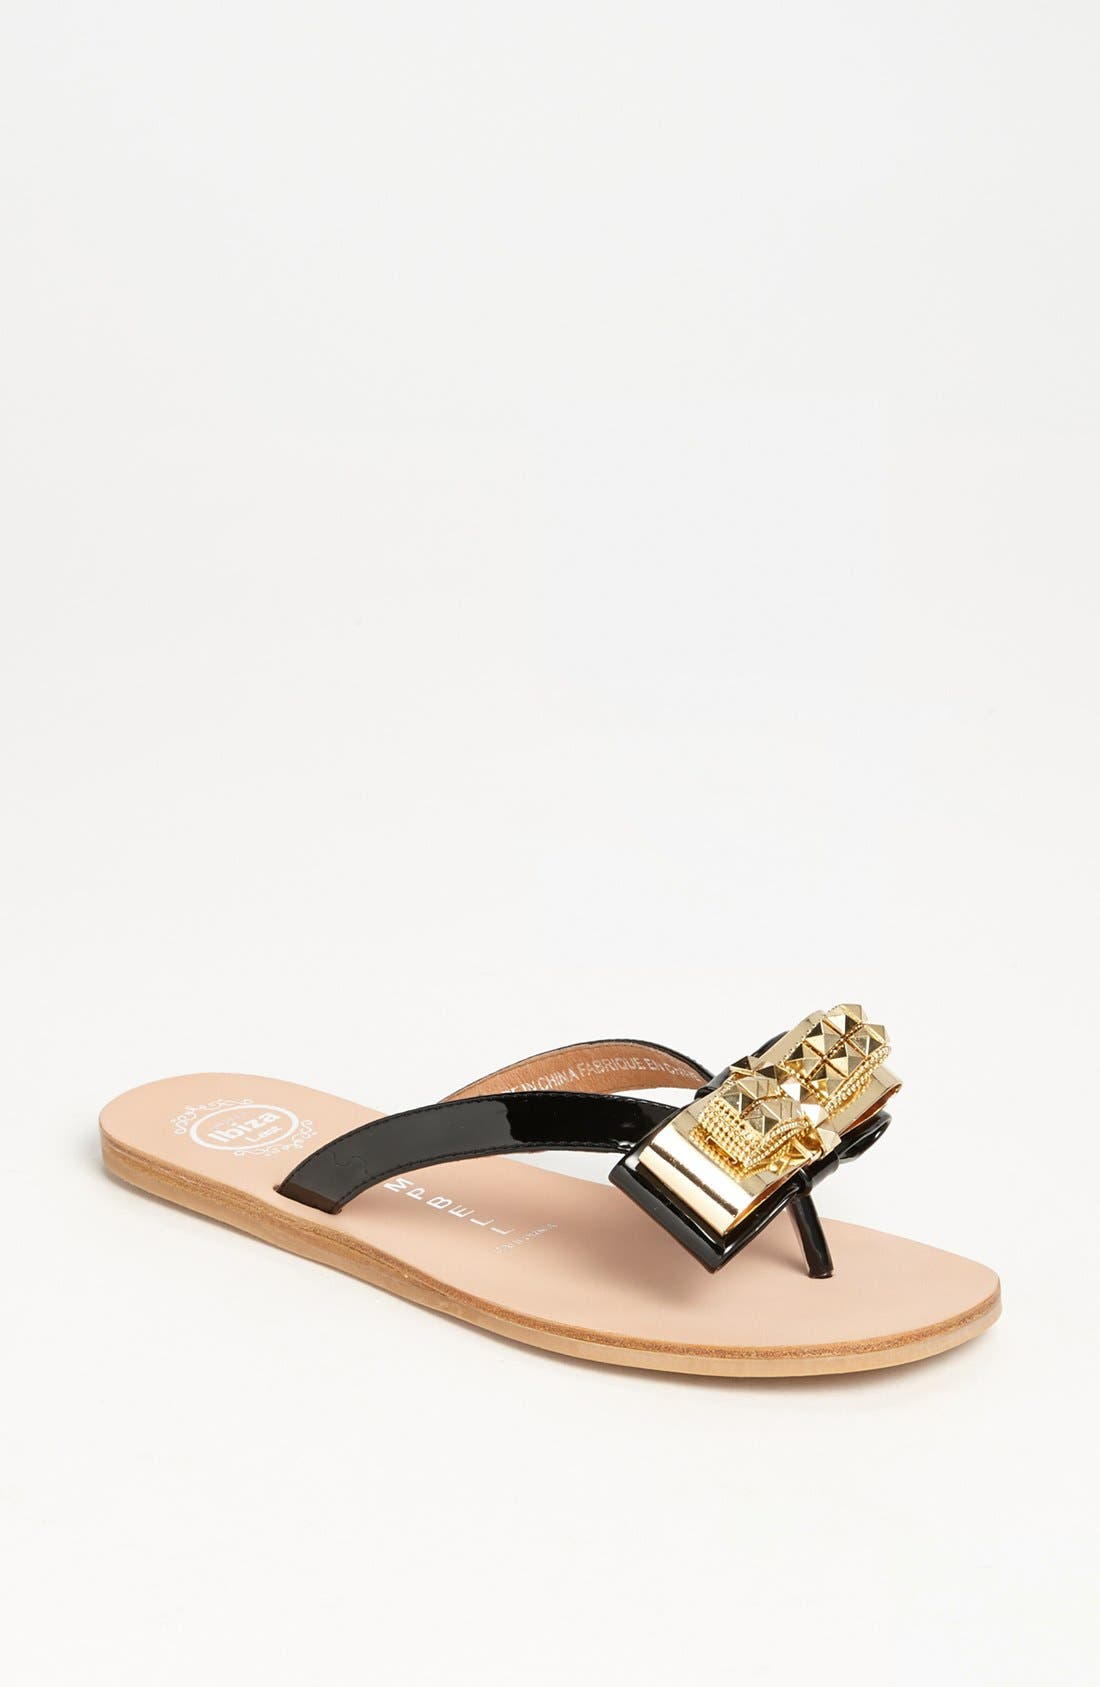 Alternate Image 1 Selected - Jeffrey Campbell 'Esme' Sandal